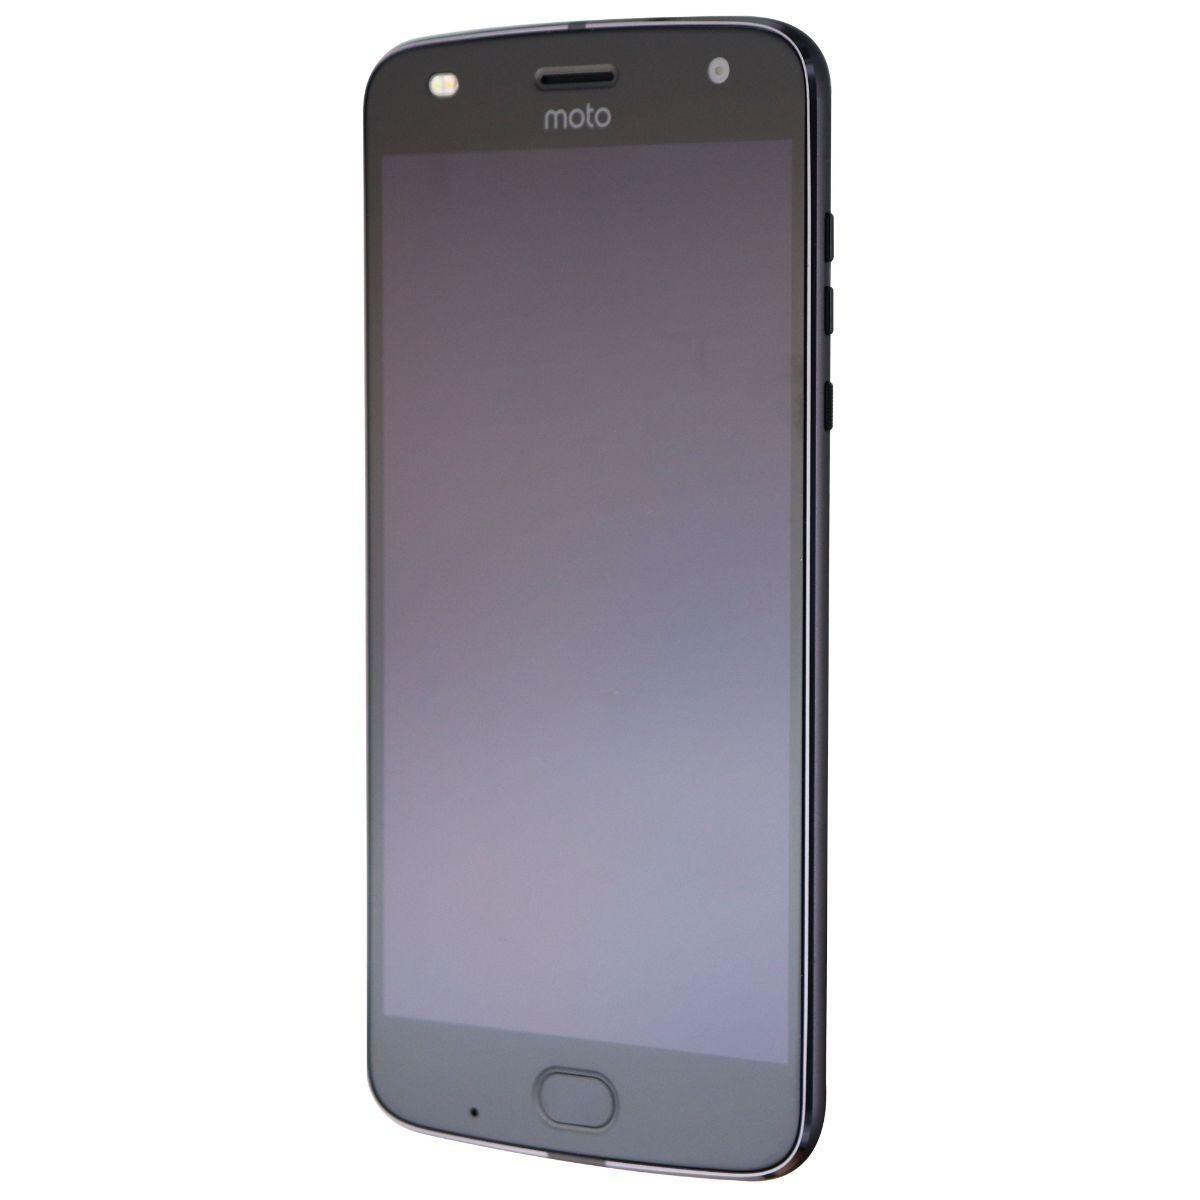 Motorola Moto Z2 Play 32GB Smartphone (XT1710-02) - Verizon Locked - Lunar Gray